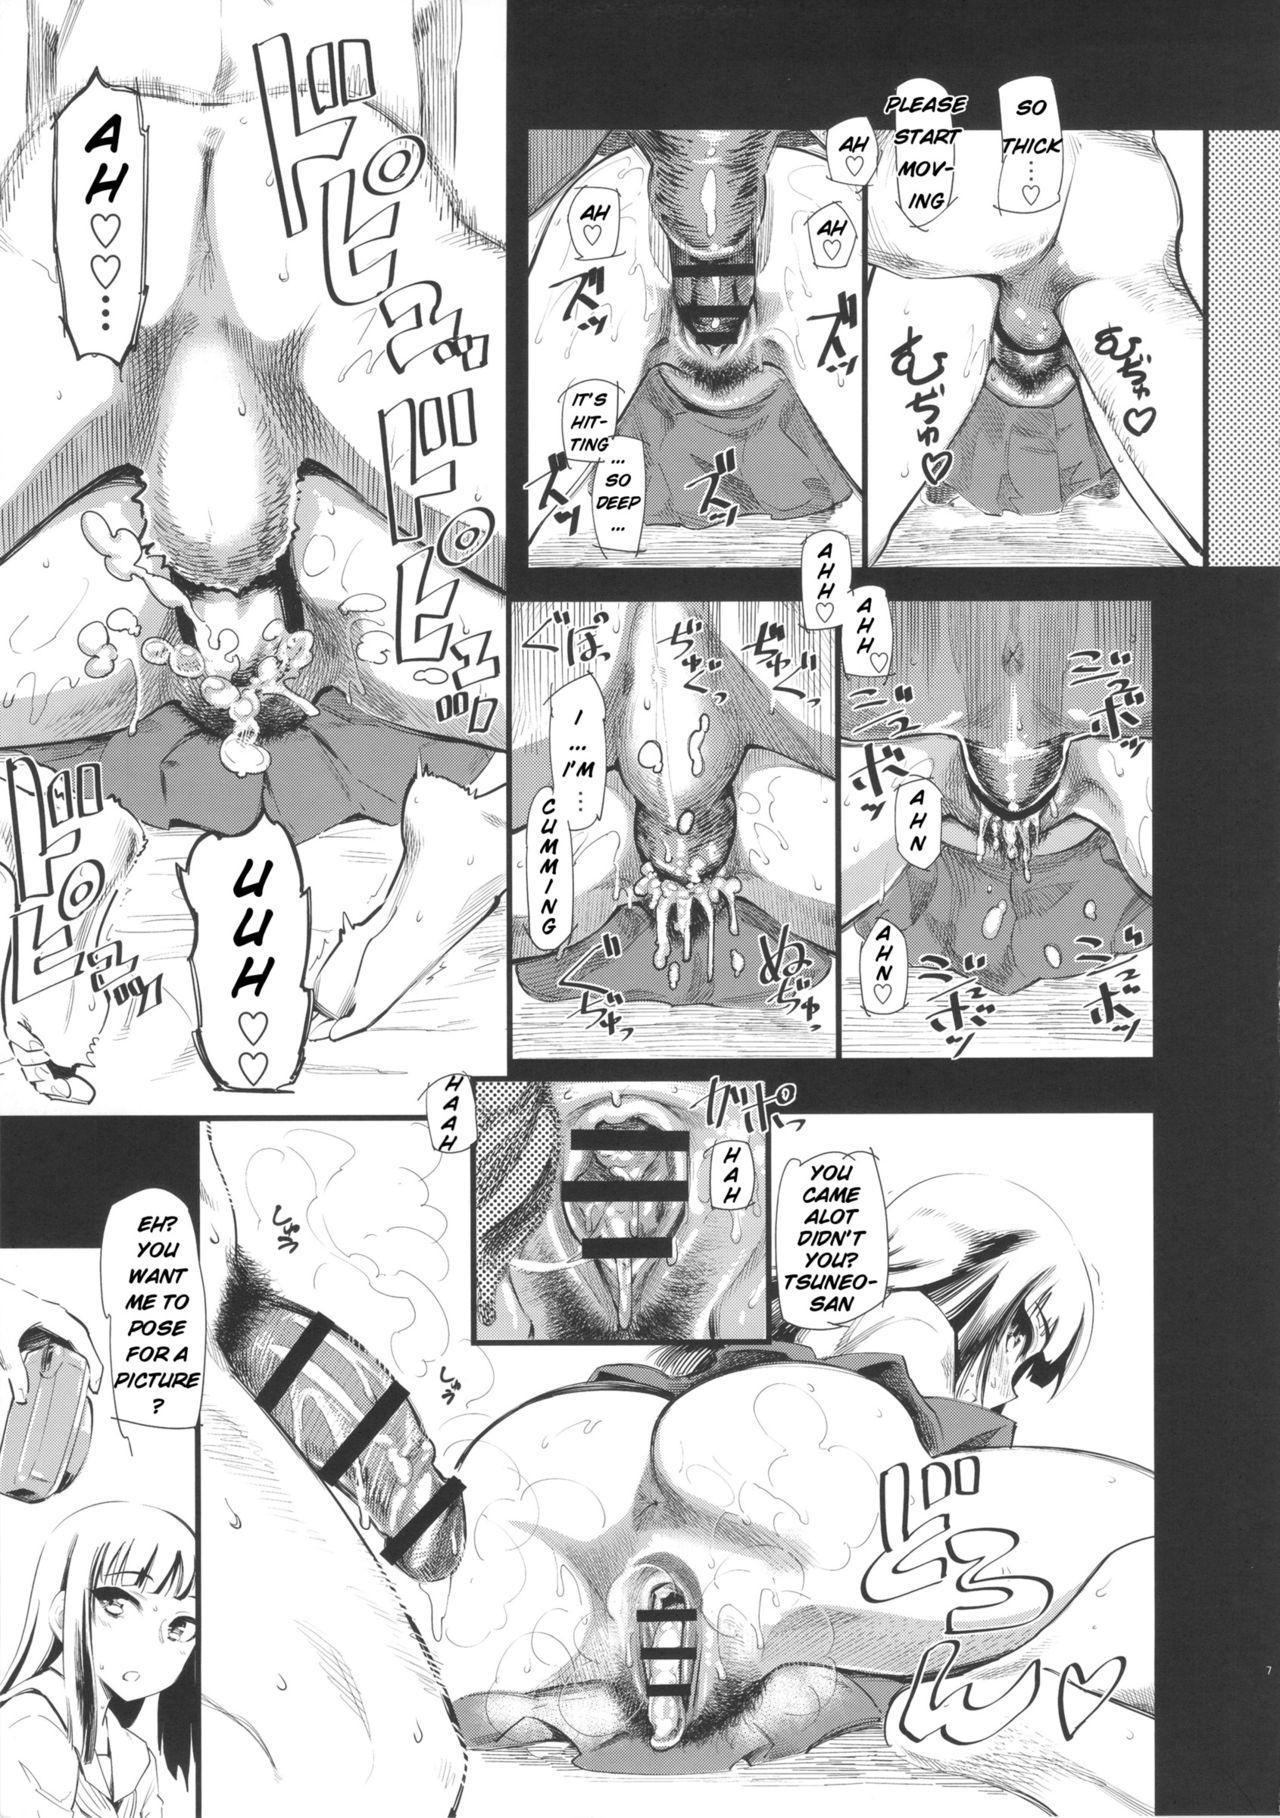 (C90) [Hi-Per Pinch (clover)] Nishizumi-san-chi wa Nakayoshi 4P | Nishizumi Household Peaceful 4-some (Girls und Panzer) [English] [4m4T] 7